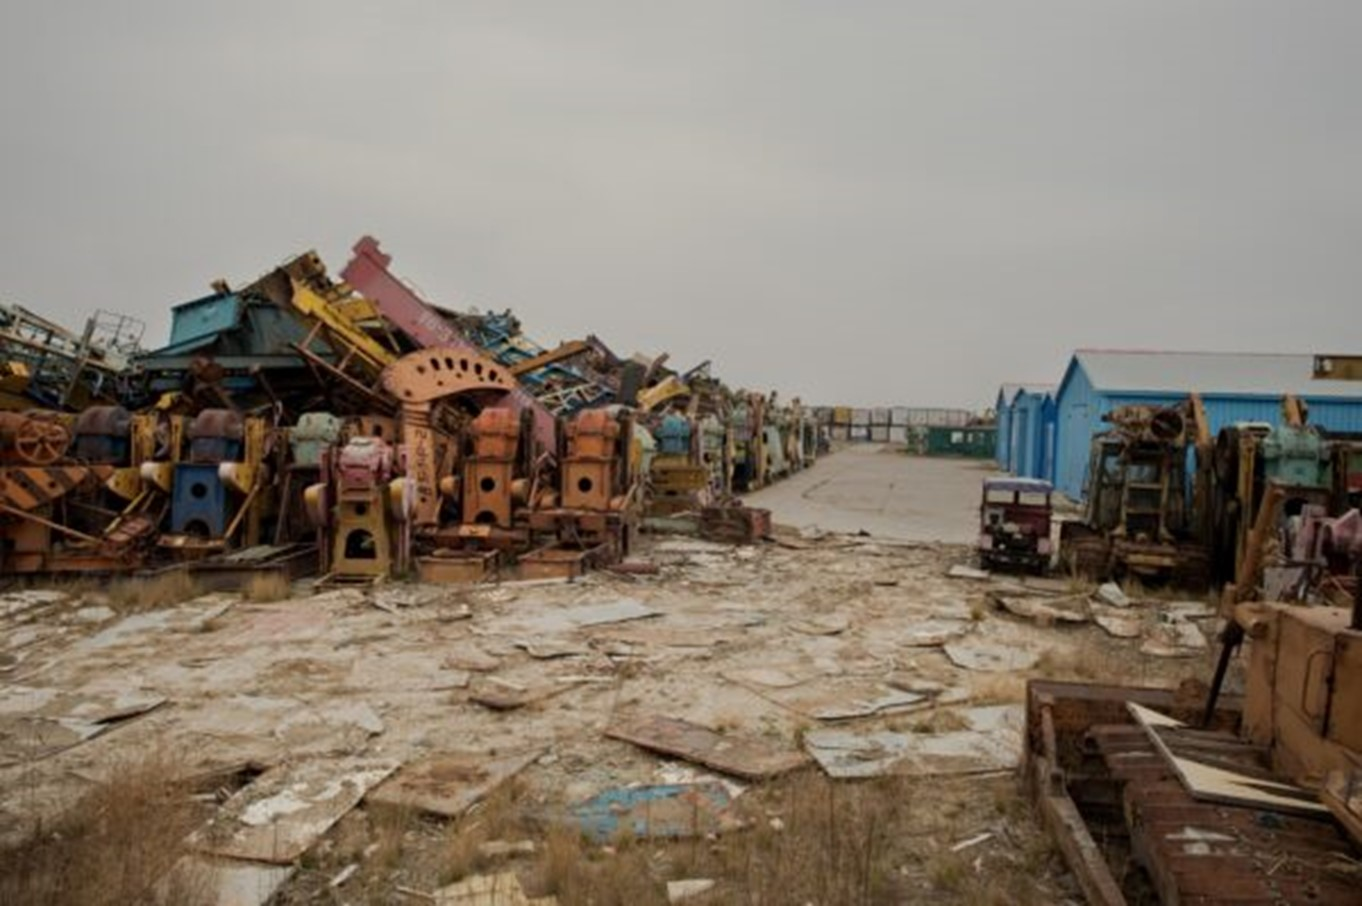 Rusted oil pump parts at a scrap yard in Daqing, Heilongjiang Province